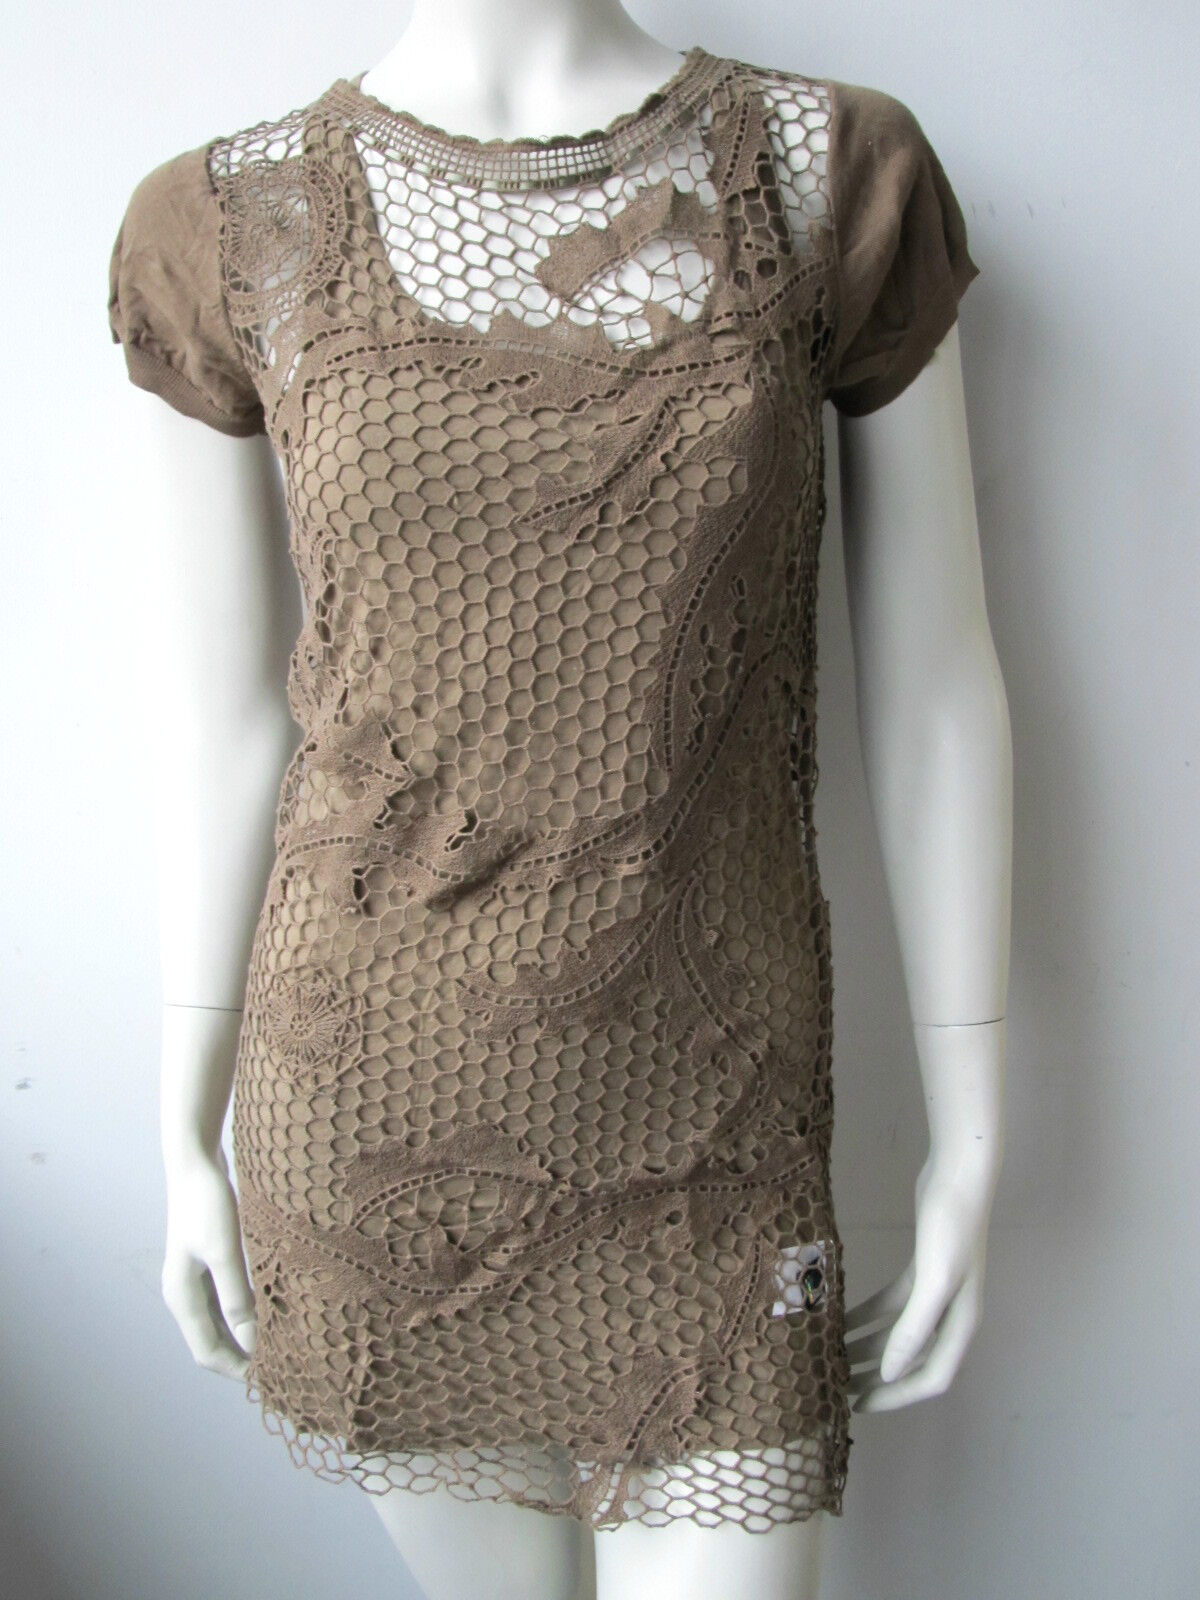 Cnc Costume National vestido kleed  dress Jurk top túnica nueva XS M  muchas sorpresas